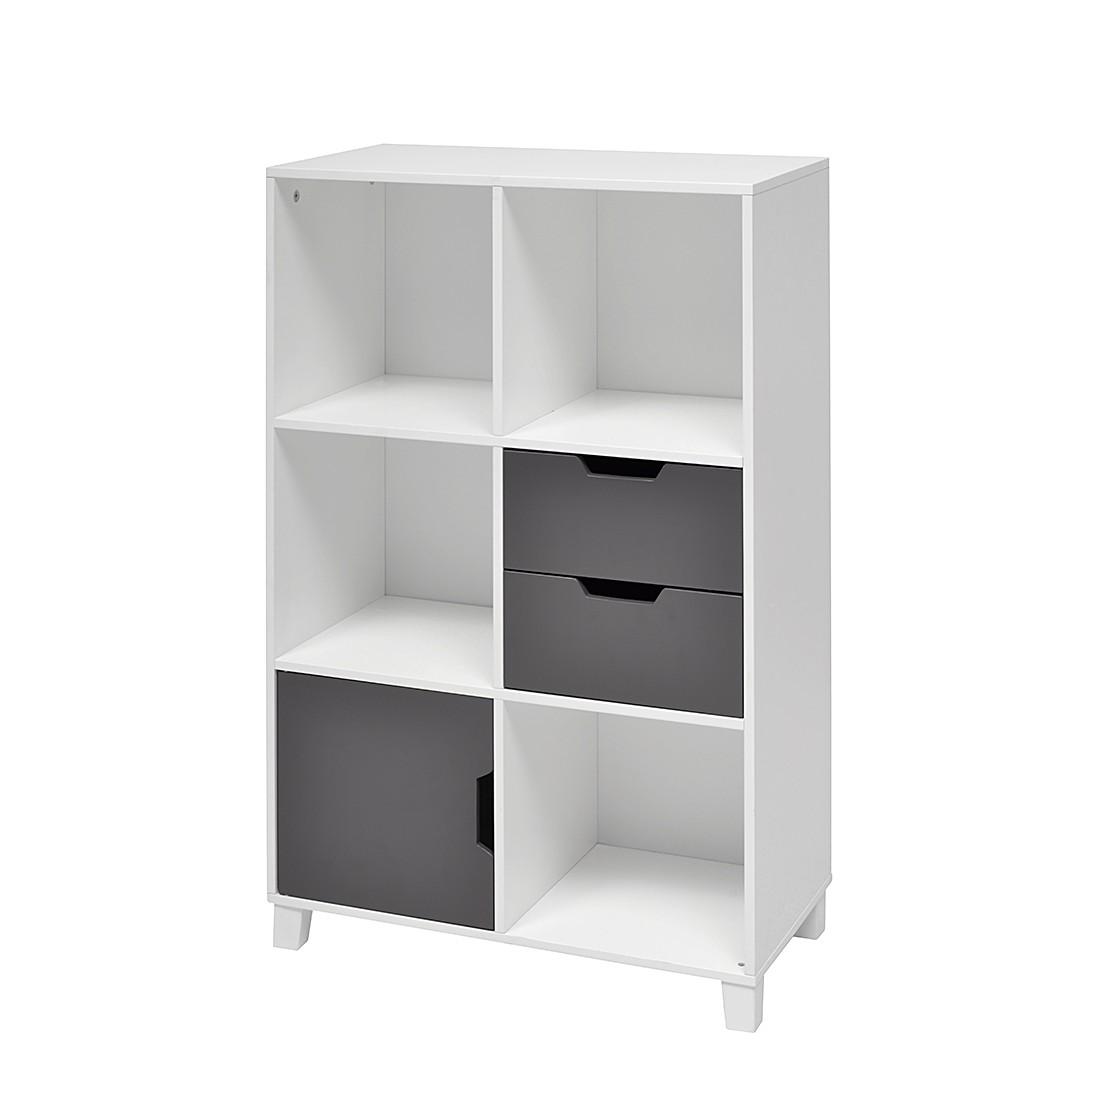 regal 30 cm tief mooved preisvergleiche. Black Bedroom Furniture Sets. Home Design Ideas